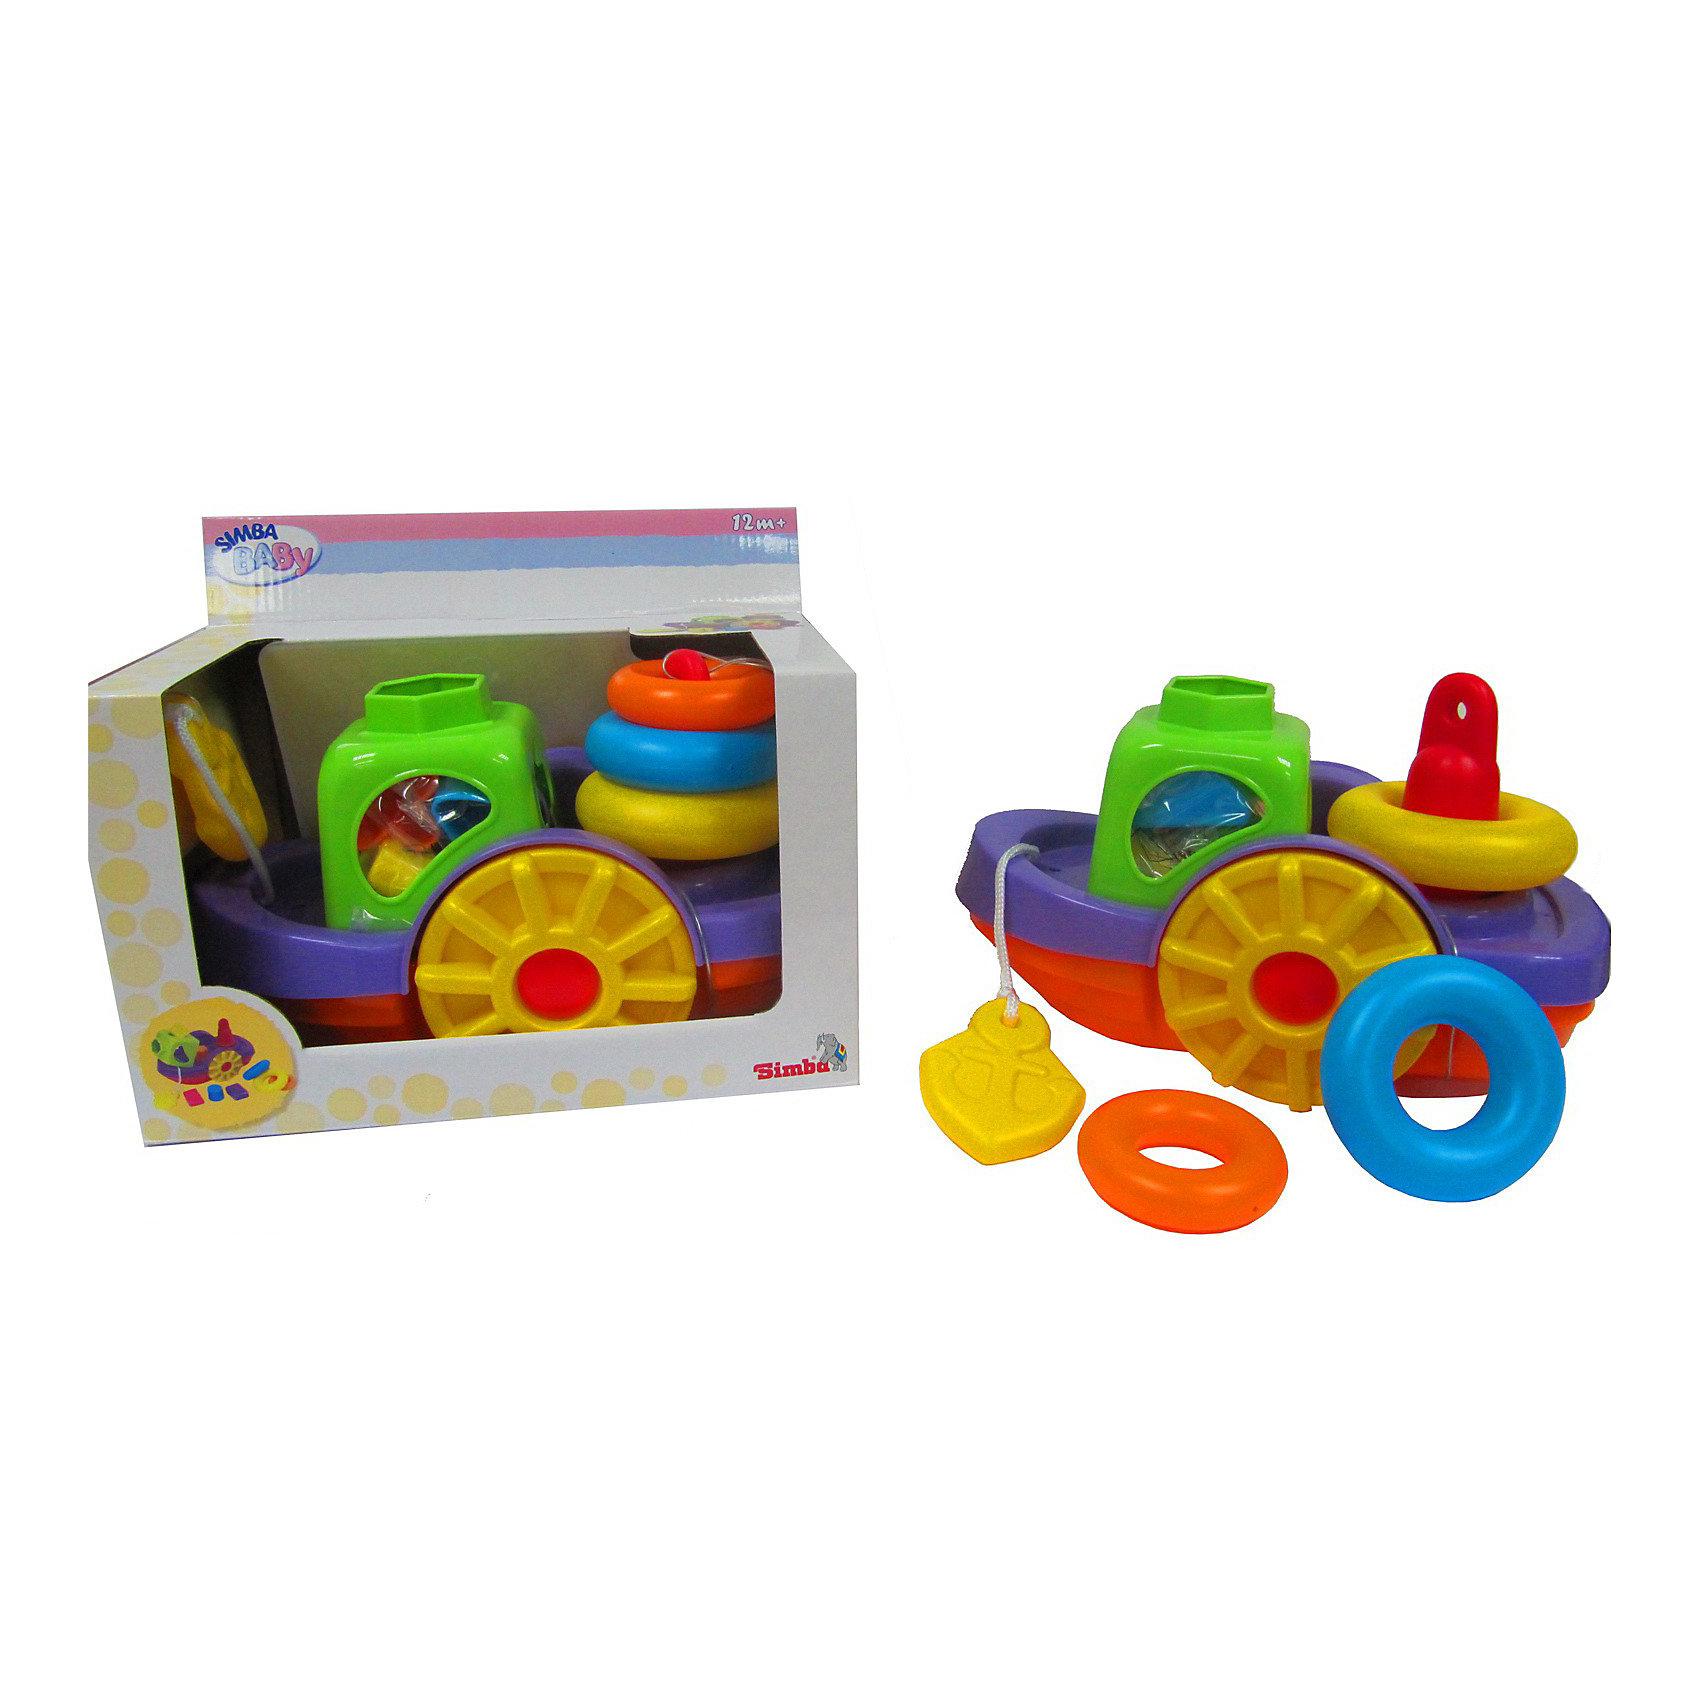 Simba Simba Игрушки для ванны simba игрушки дл ванны 4012072